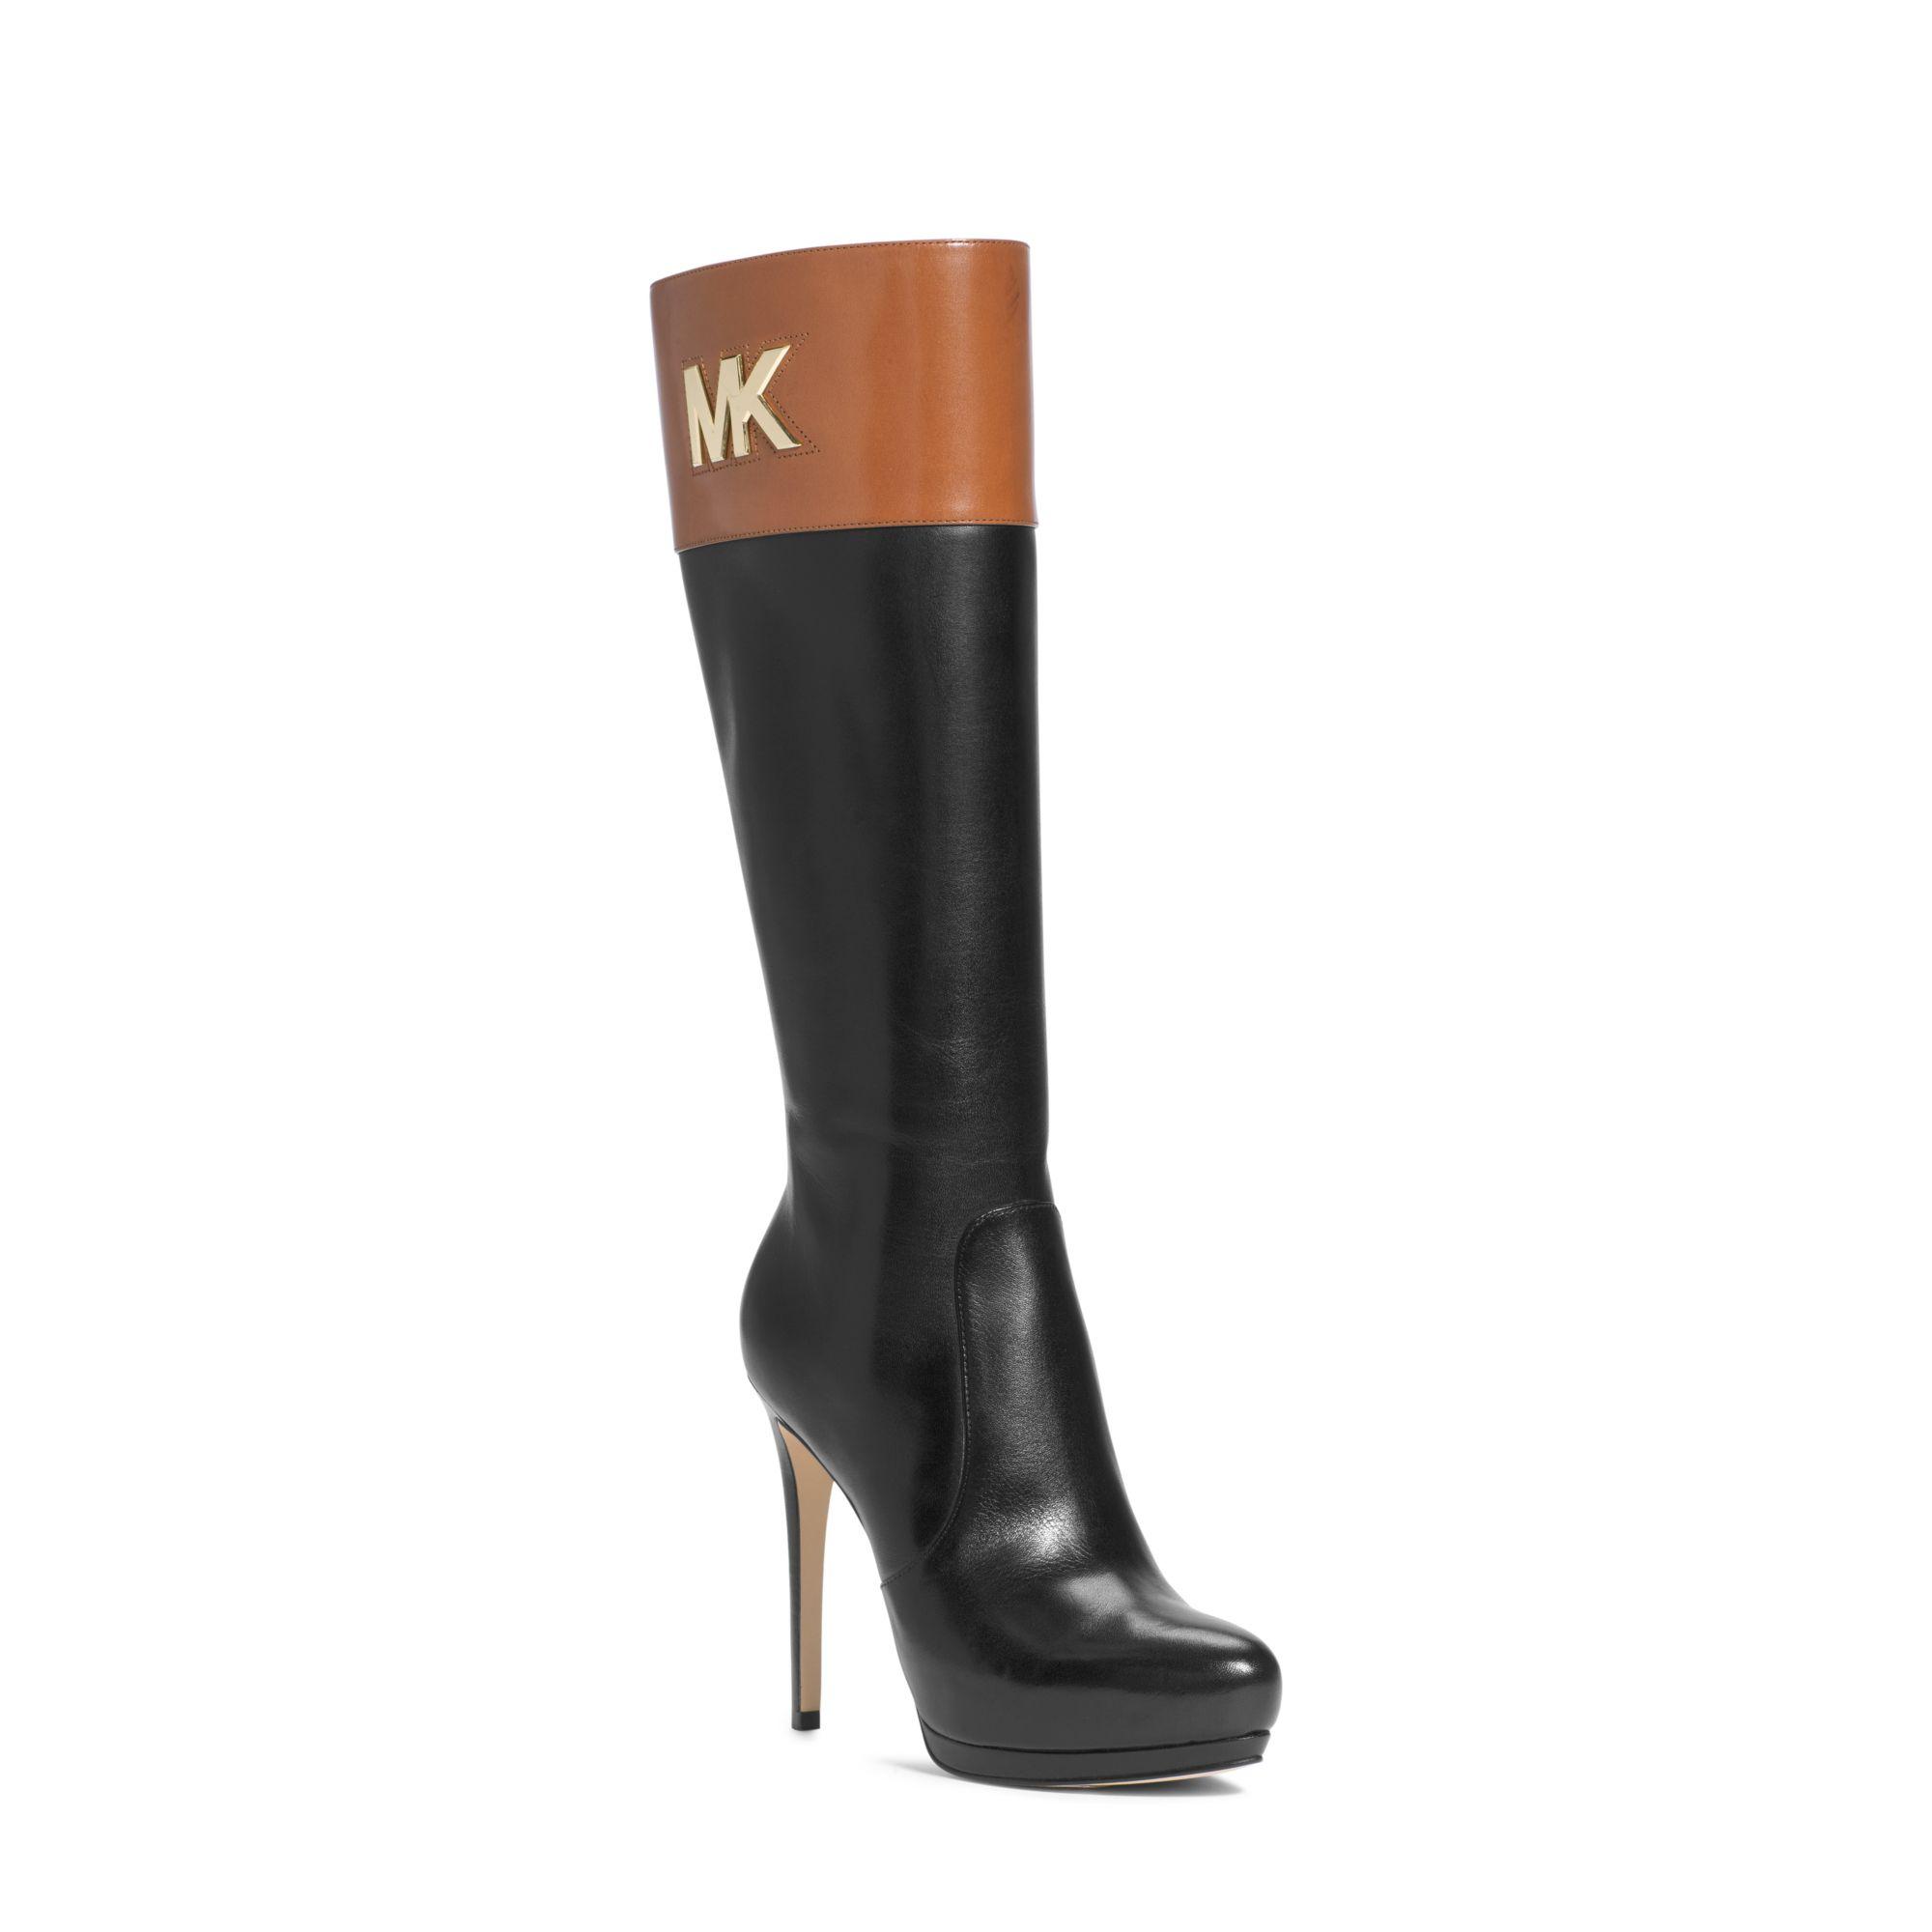 6bae6a5f889 Michael Kors Black Hayley Boot